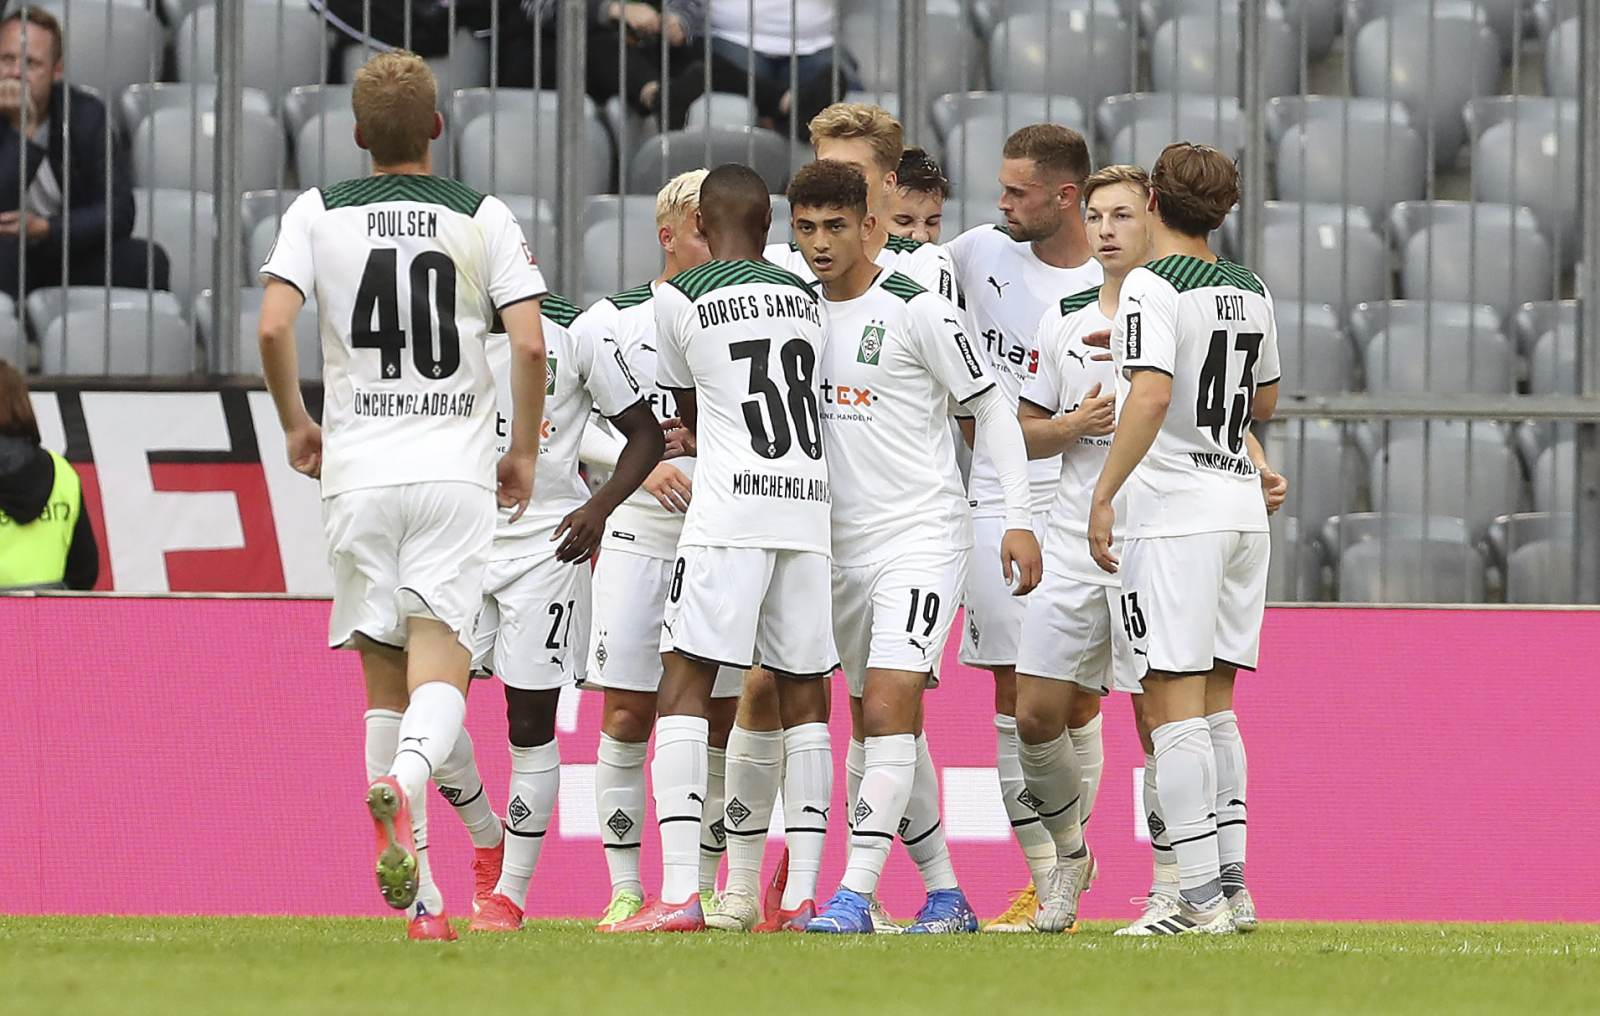 «Кайзерслаутерн» – «Боруссия Мёнхенгладбах»: прогноз на матч 1/32 финала Кубка Германии